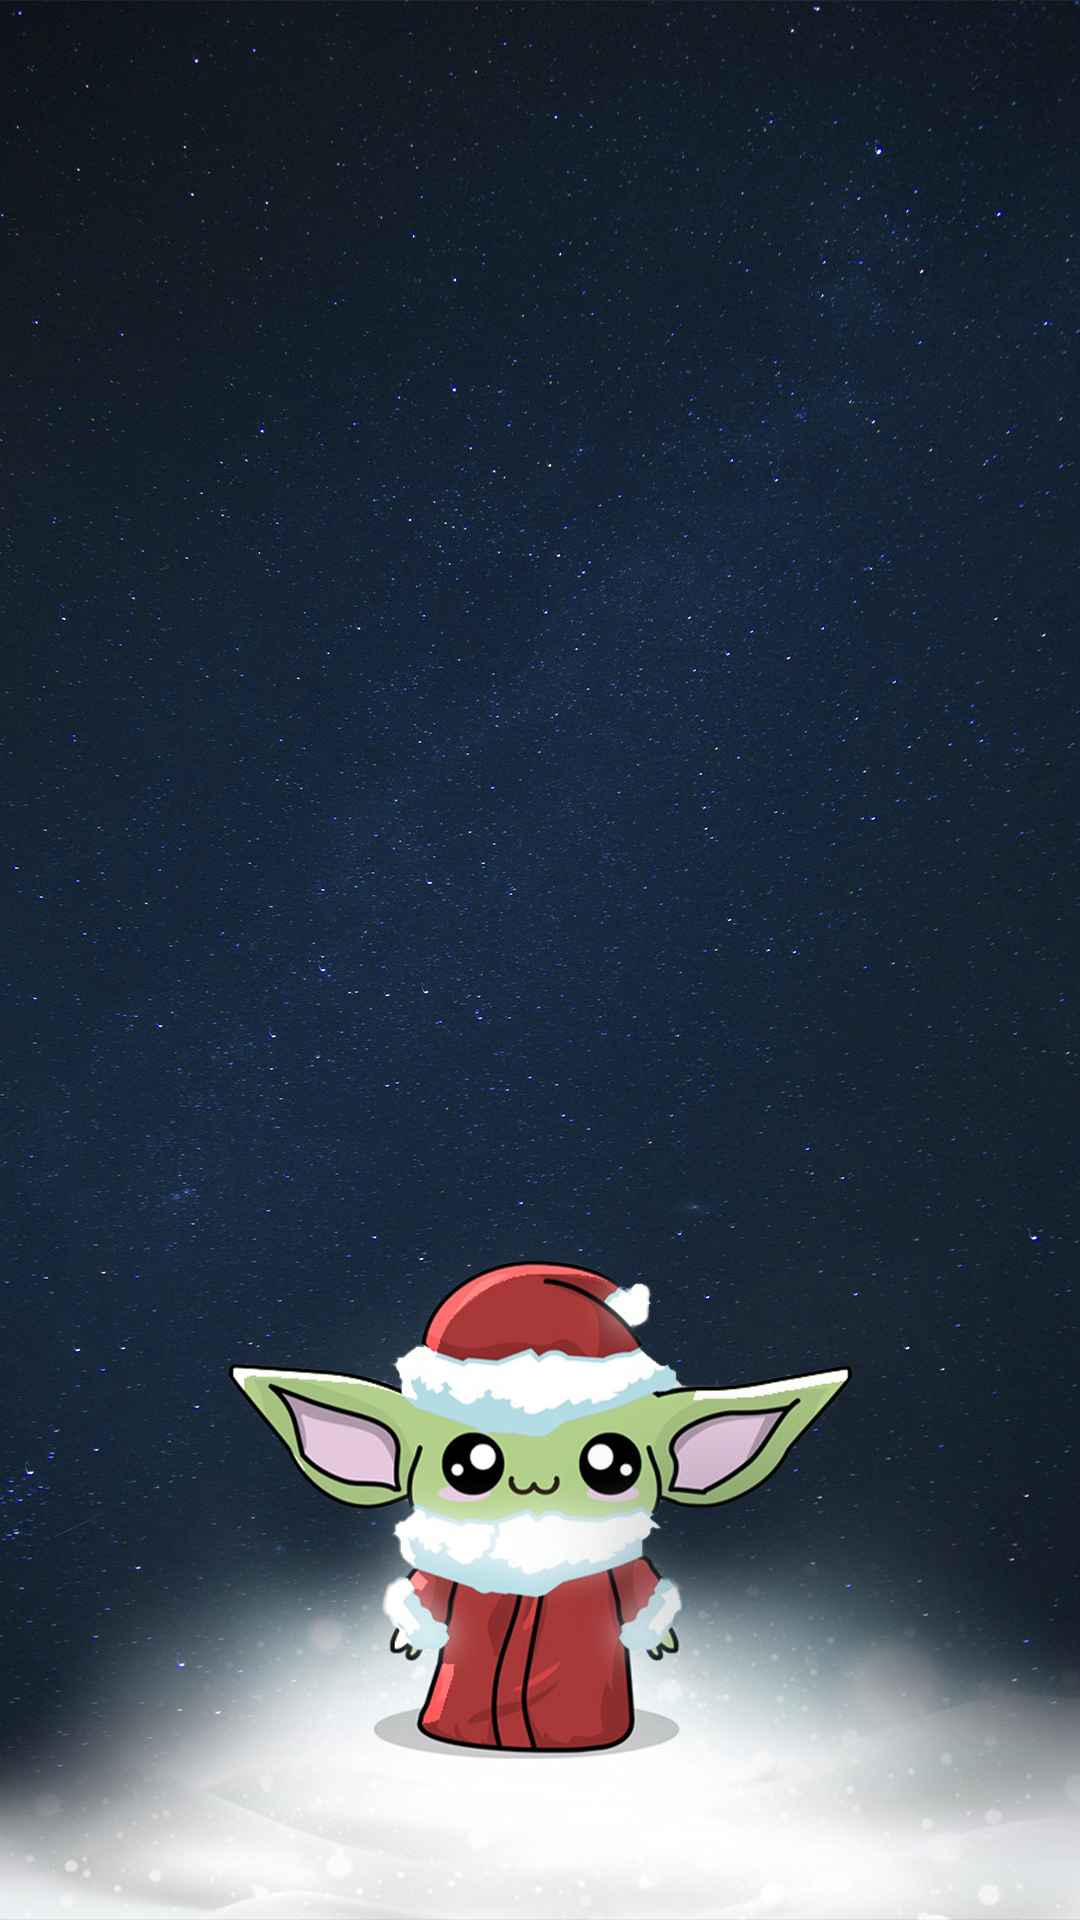 Baby Yoda Wallpaper Iphone 1080x1920 Wallpaper Teahub Io